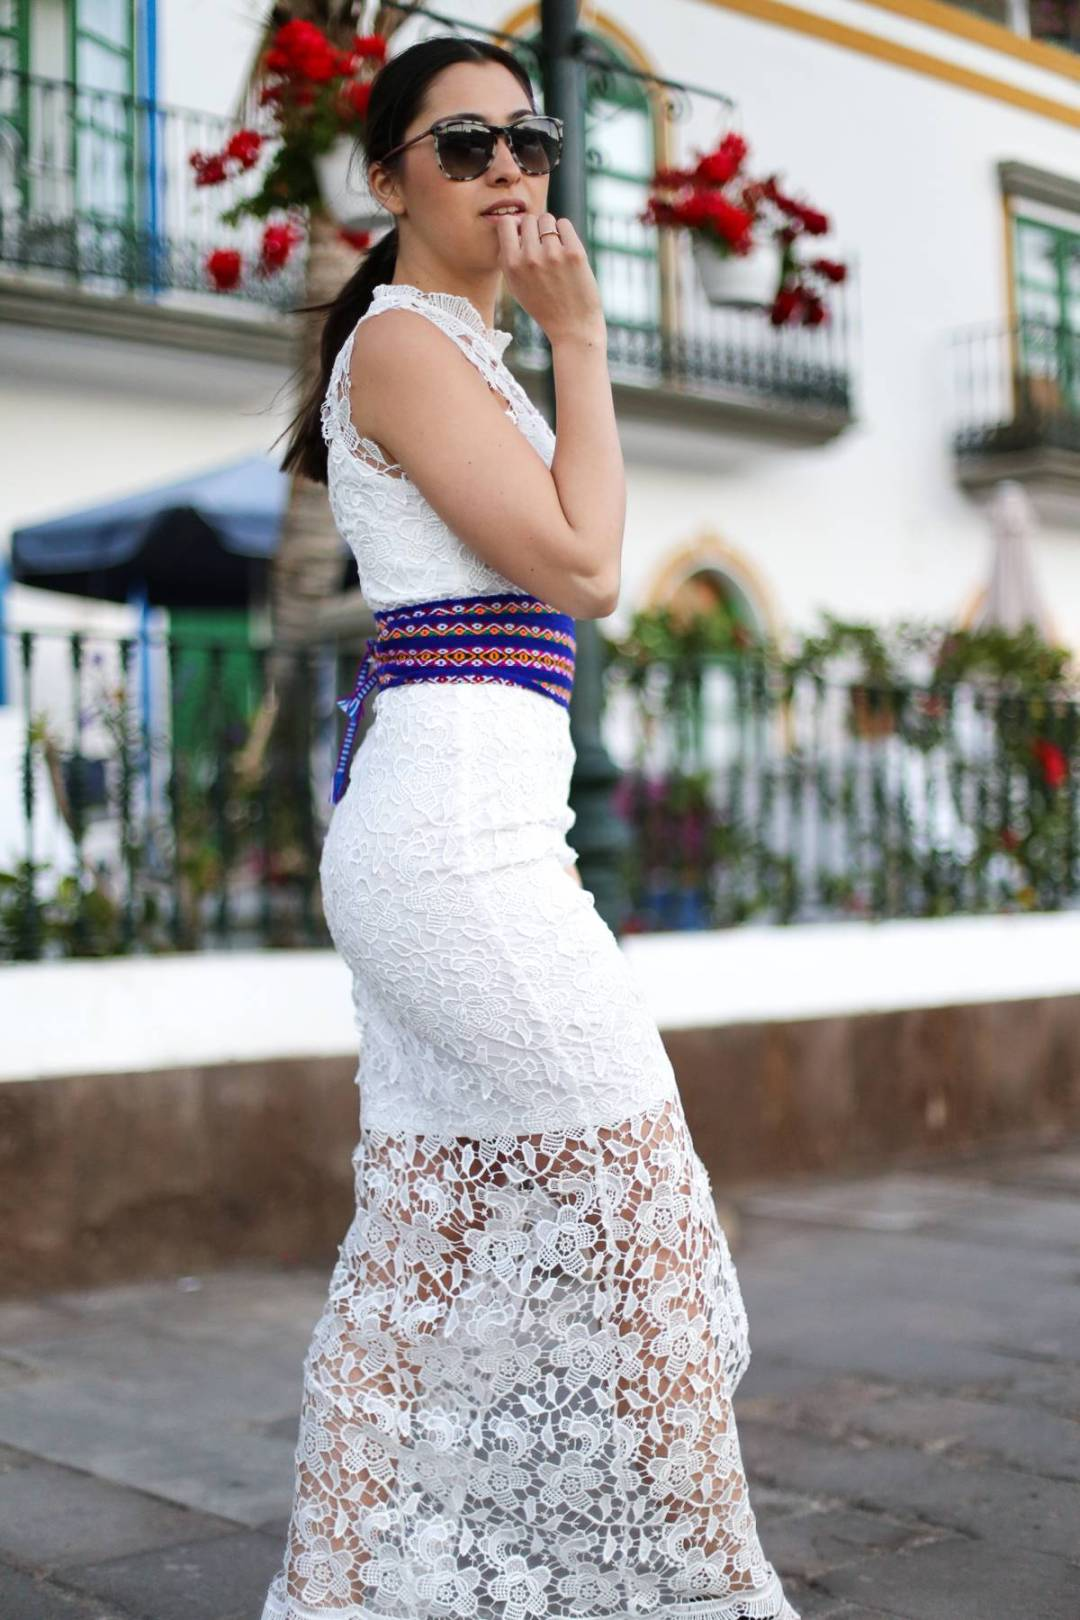 Streetstyle - Puerto de Mogán - Travel - German Fashionblogger - Summerlook - White Lace - Maxi Dress - Ethno Details - Black Sandals - Gucci - Inspiration - Stilmix